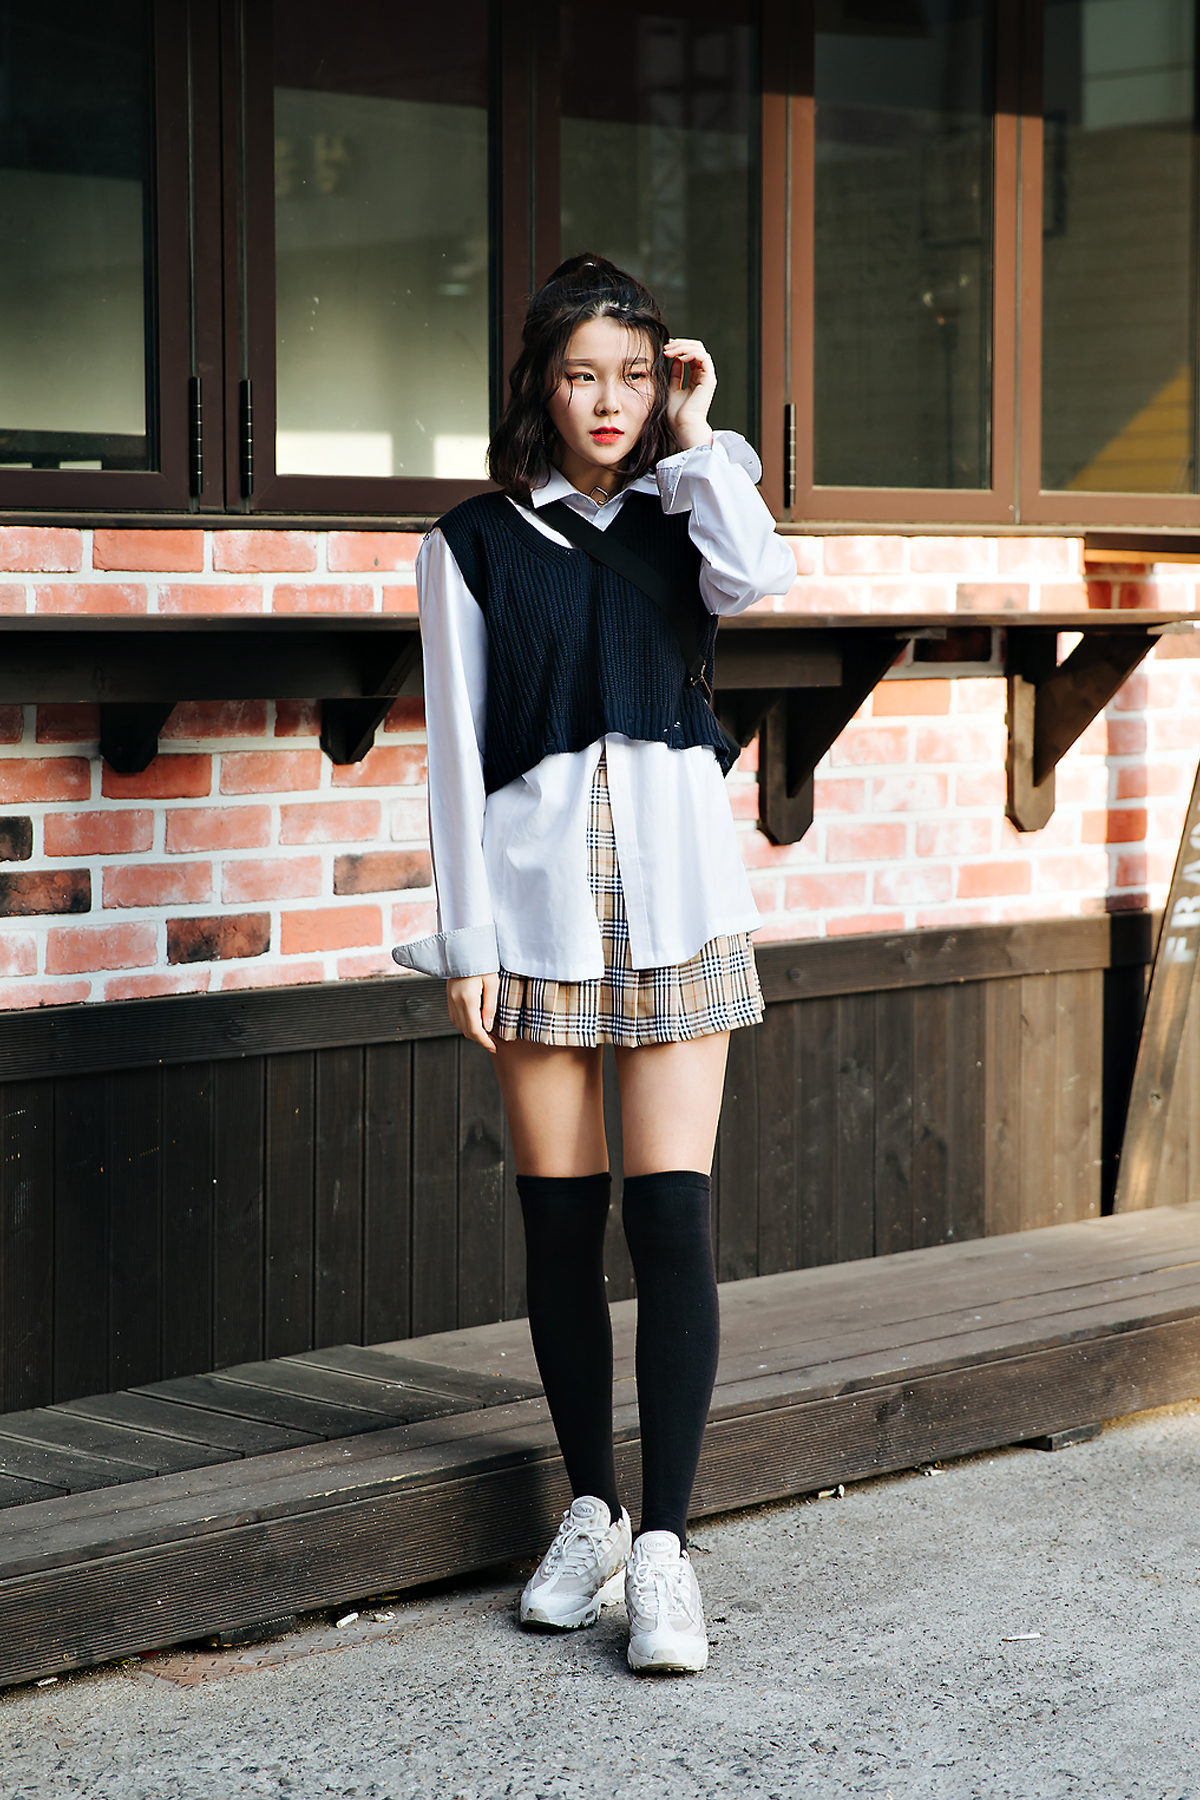 Lee Saemsol, Street style women spring 2018 in seoul